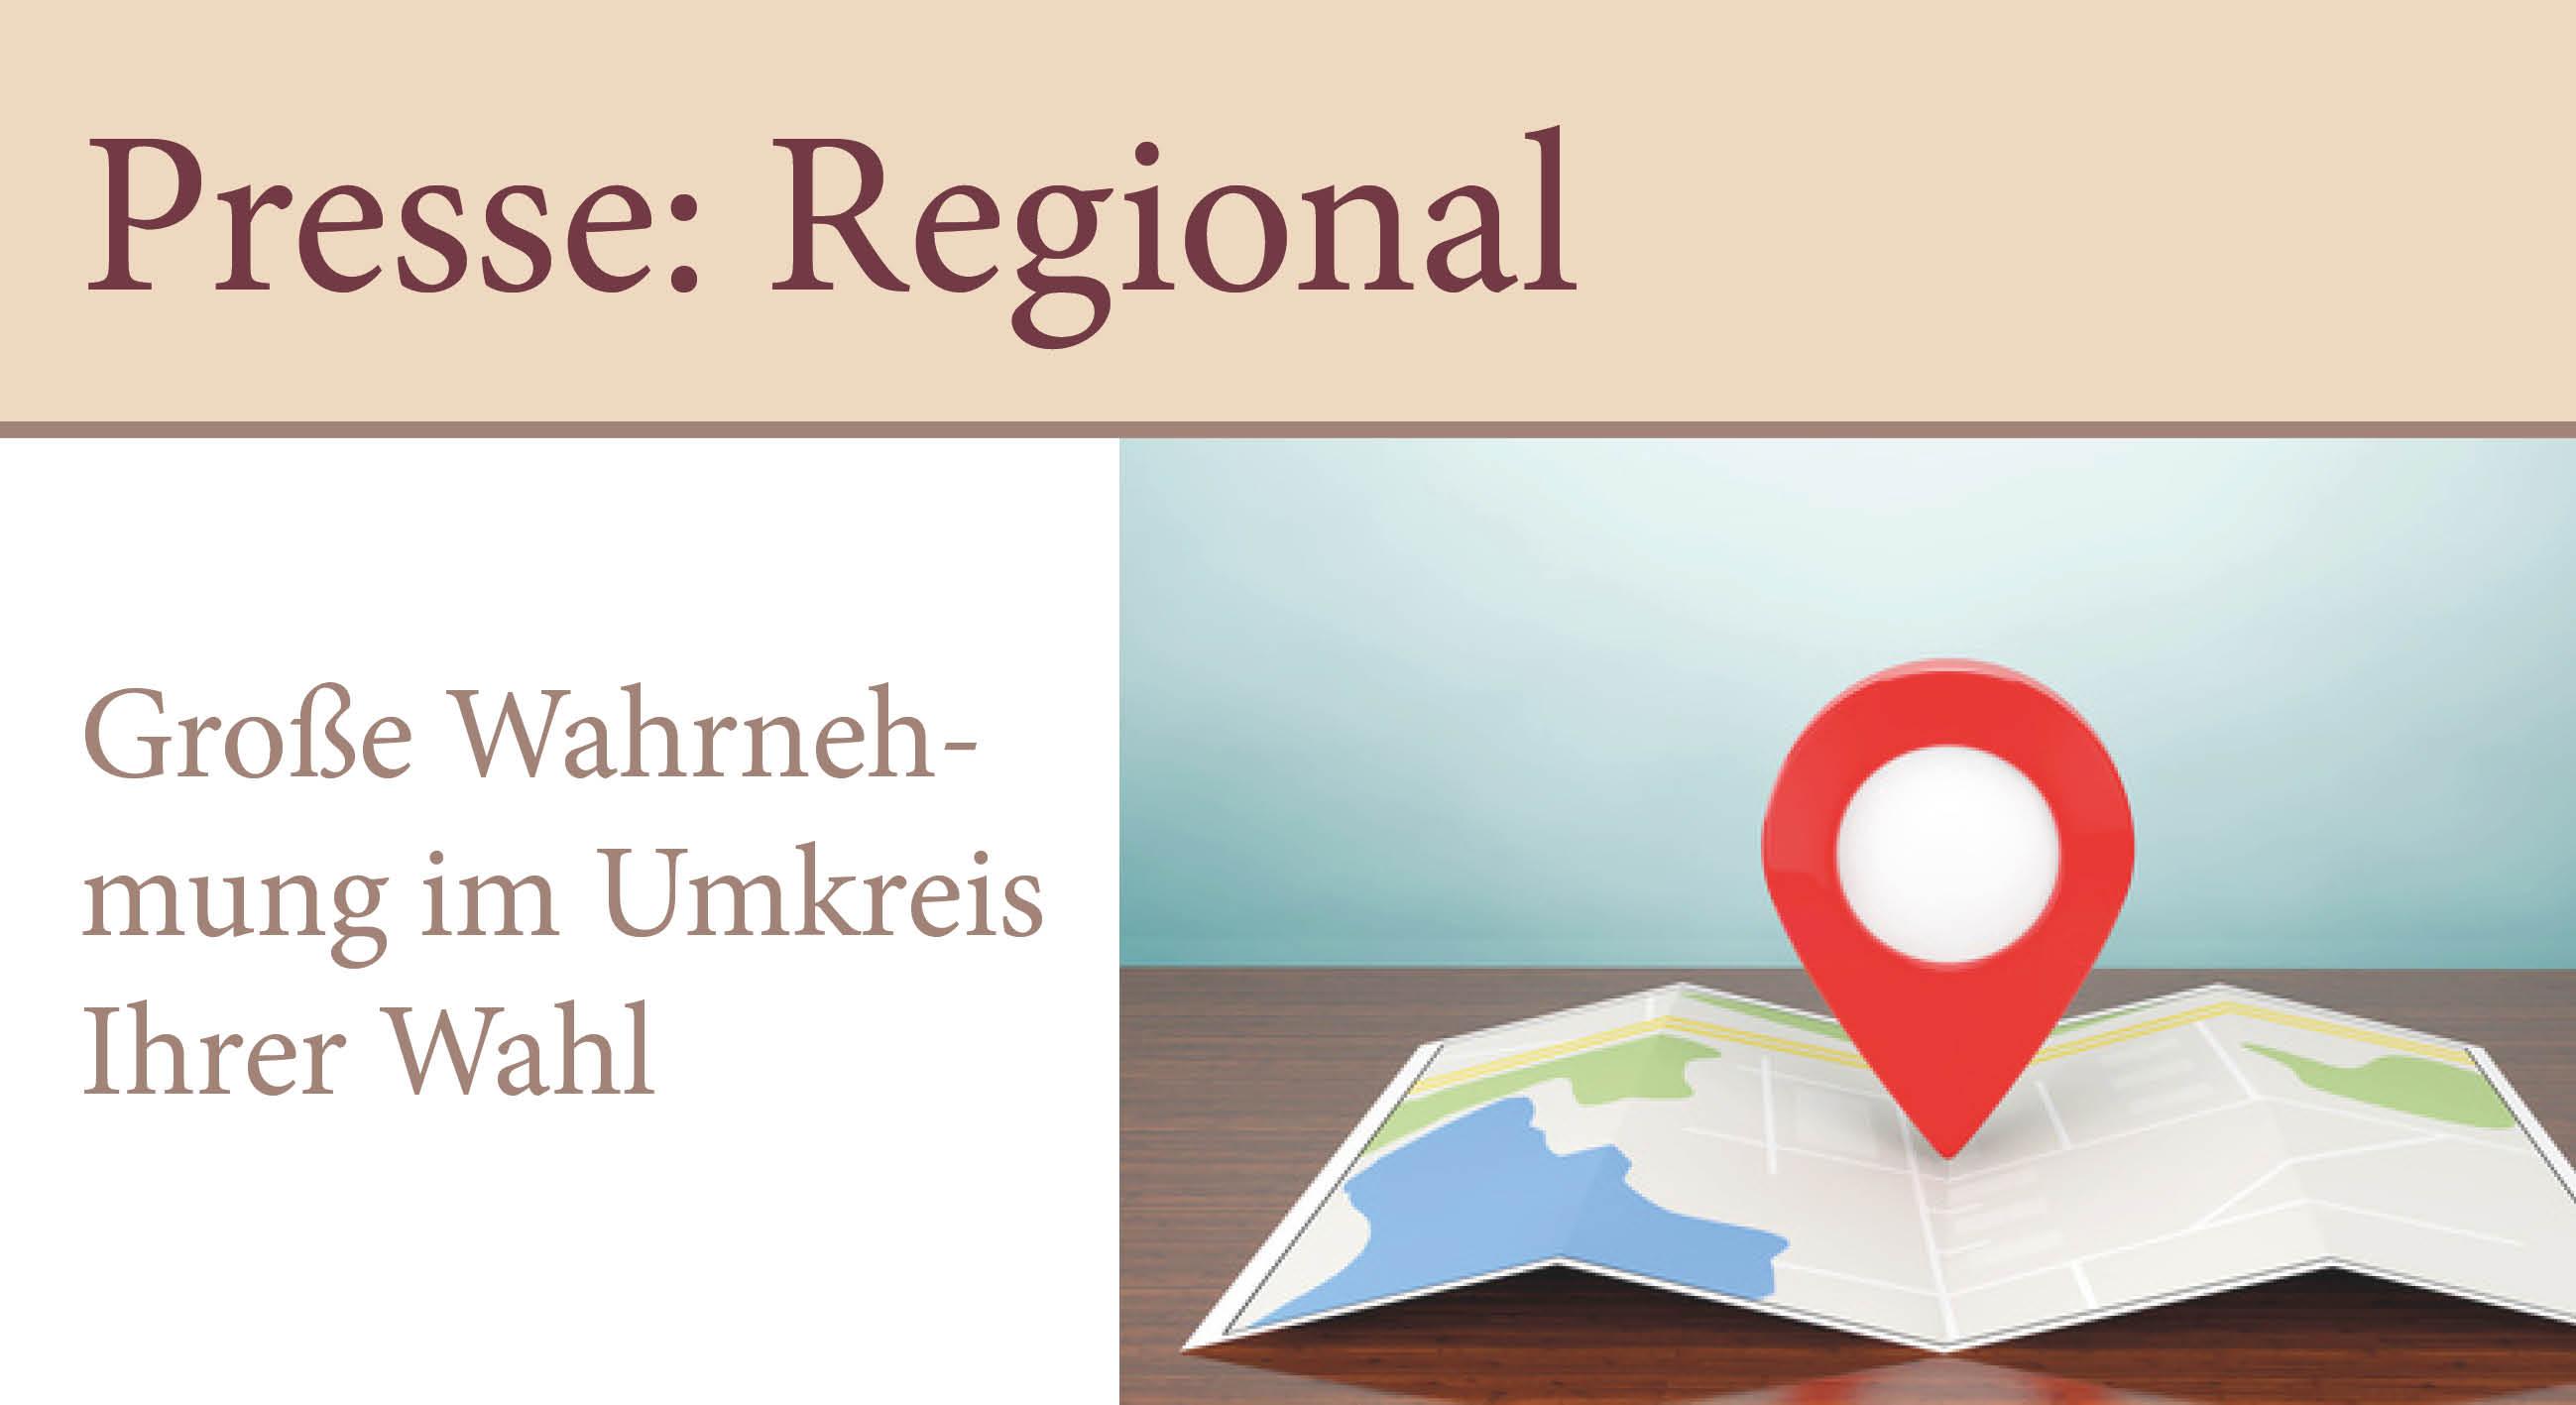 Presse Regional